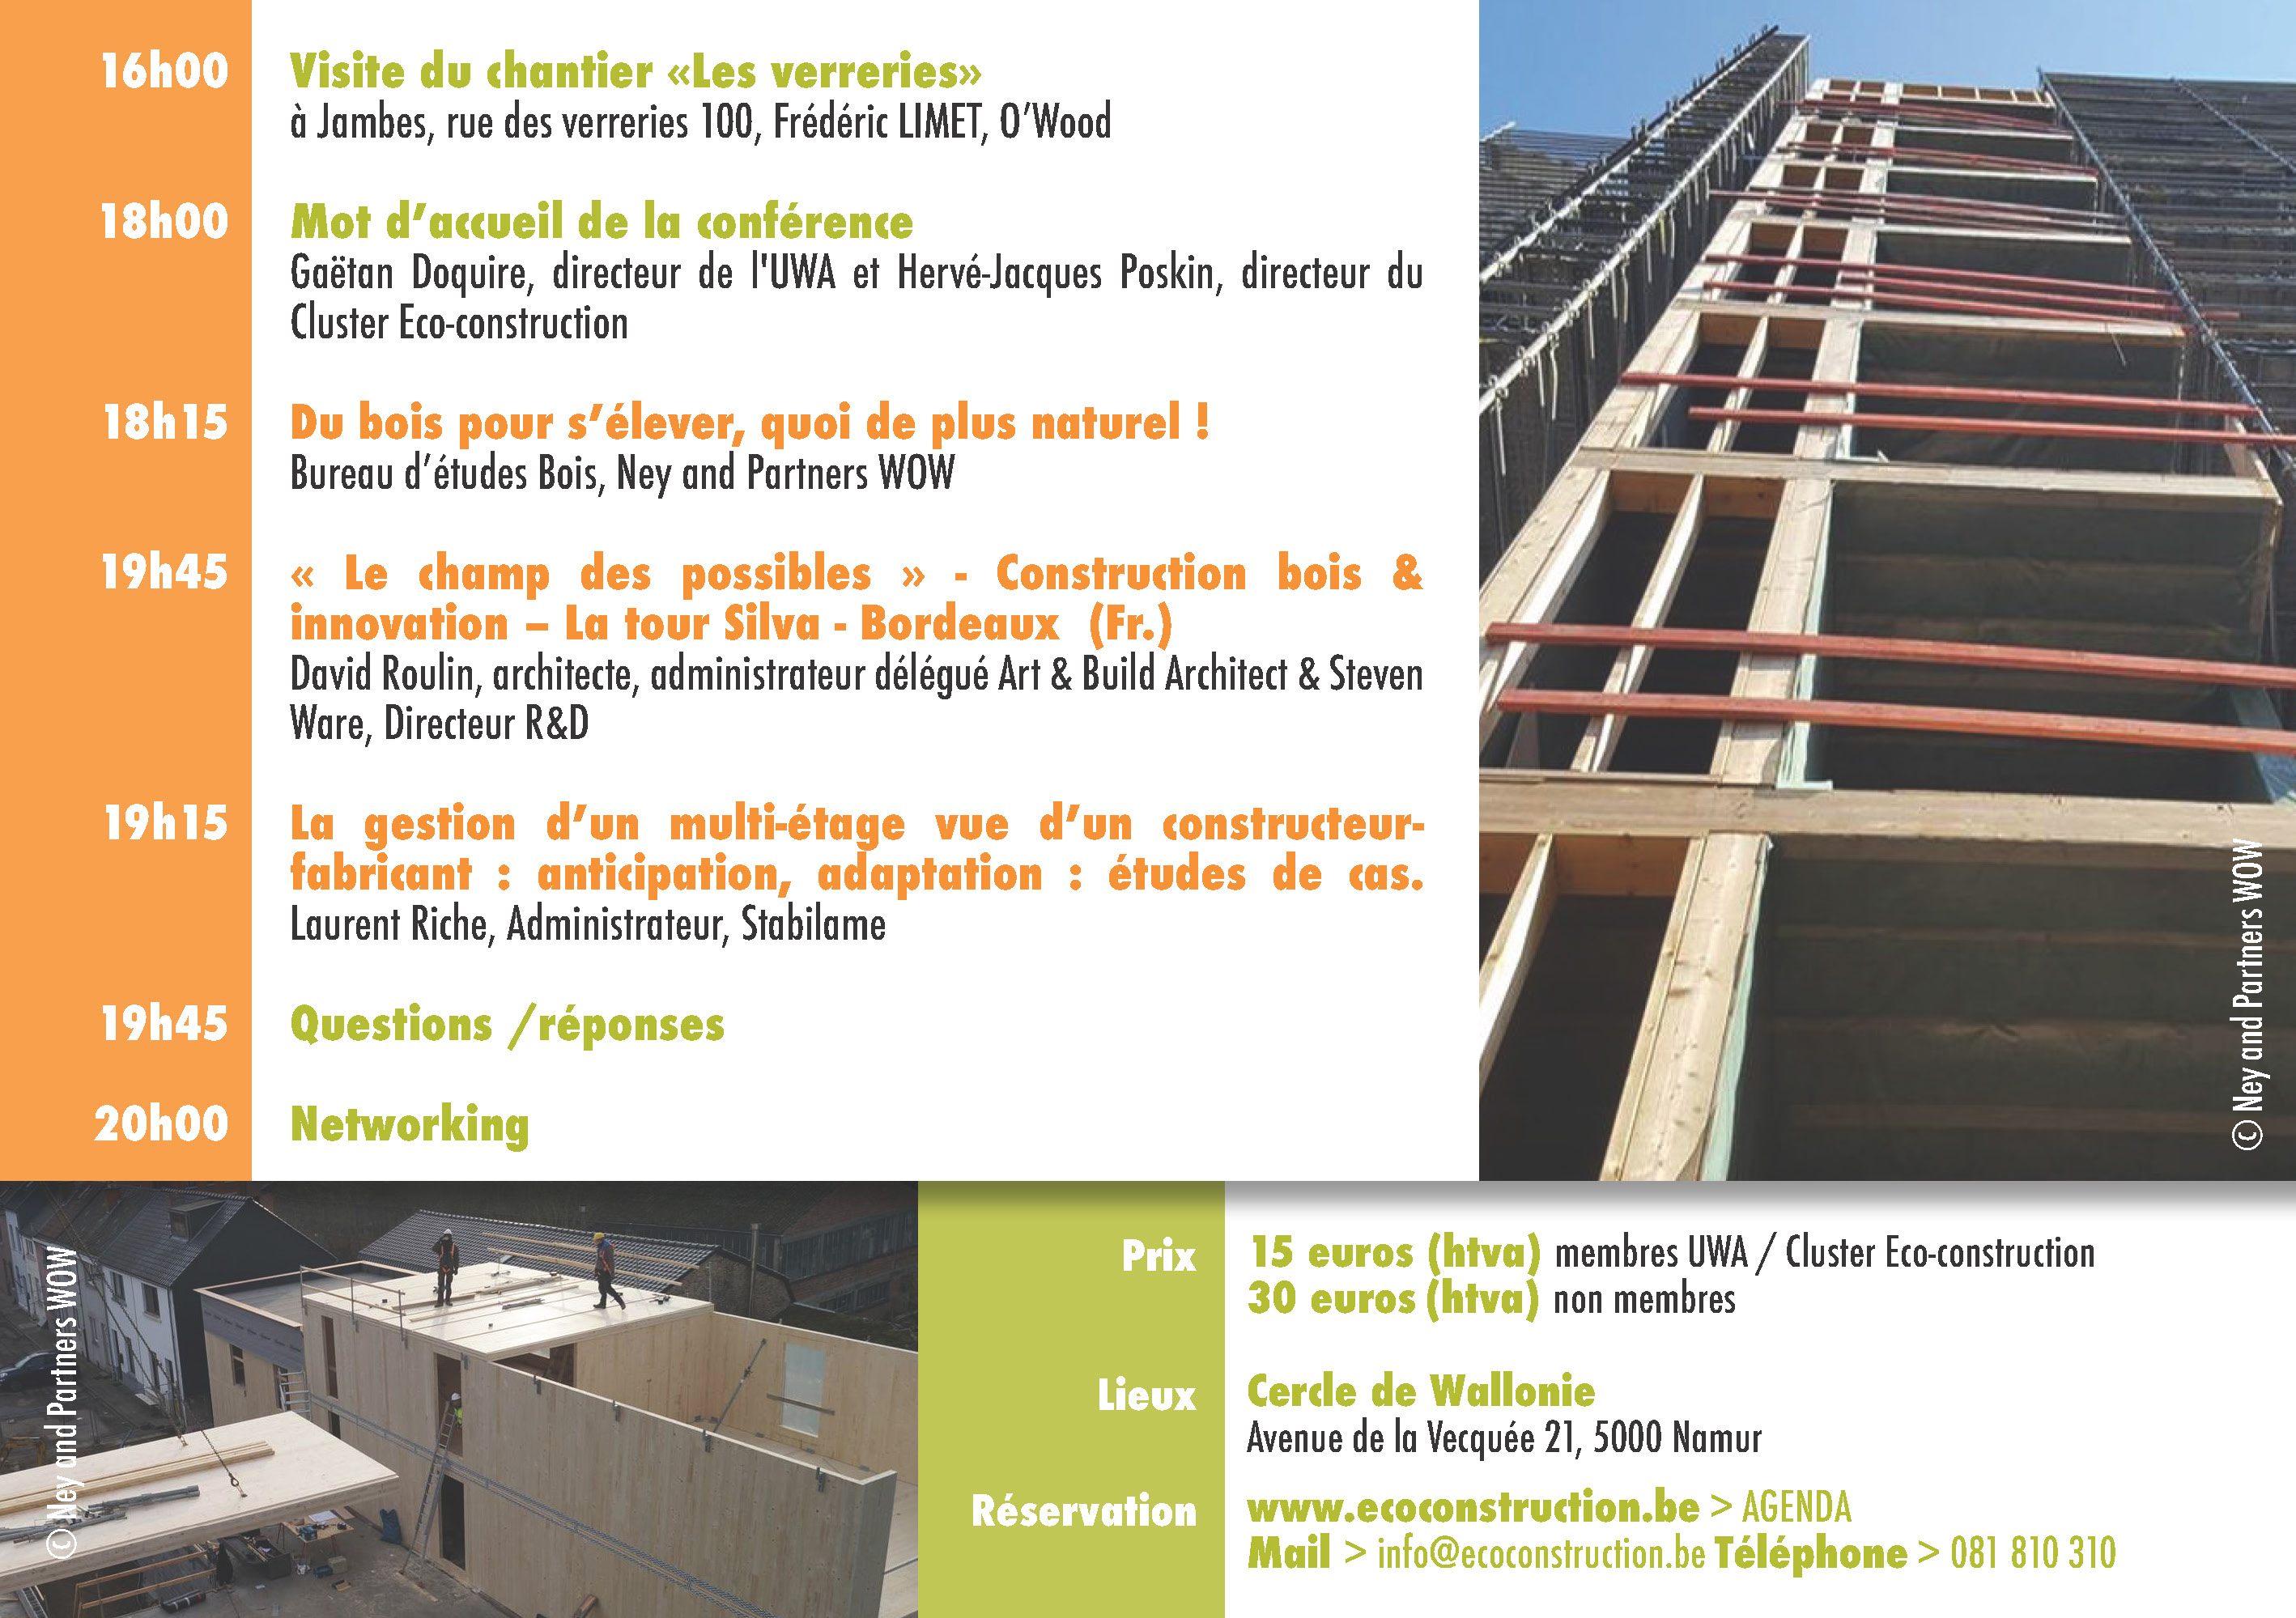 Cluster-Academy-ecoconstruction-ordre-architecte-bois-clt-Multi-etage-ingenieur-cross-laminated-timber